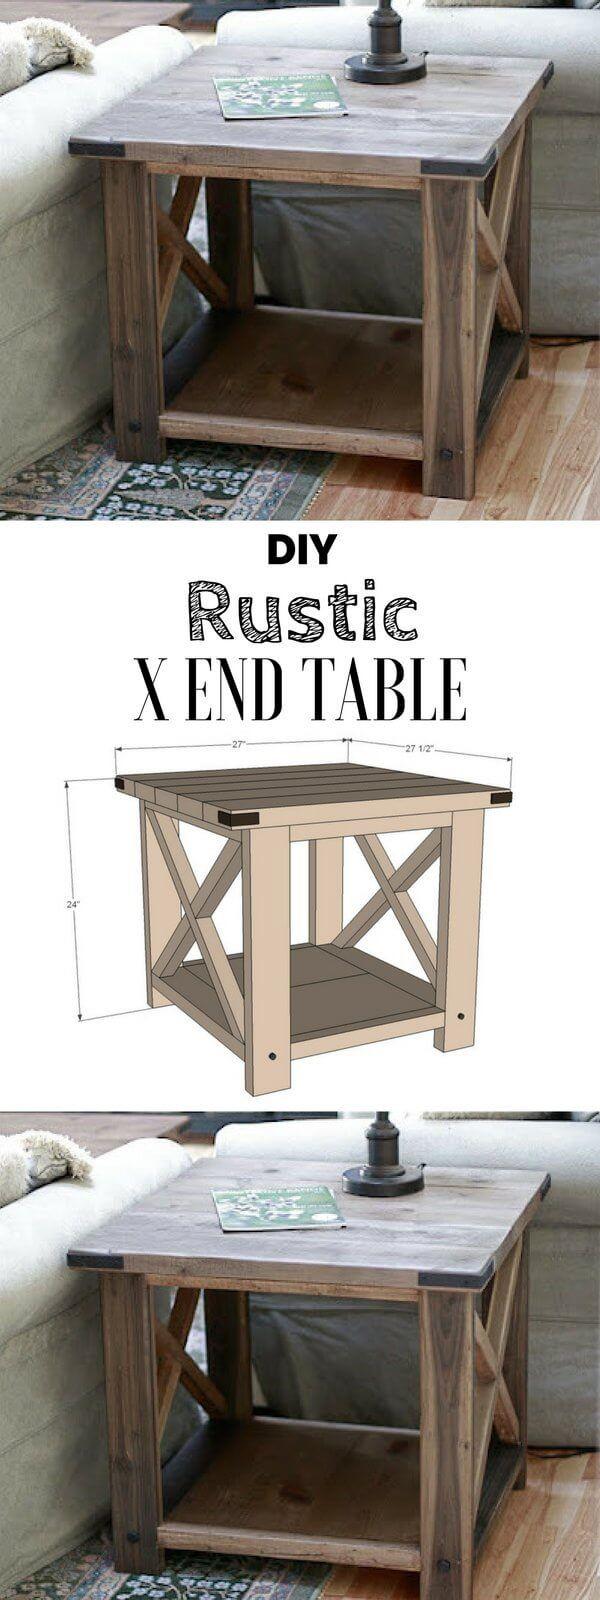 X + End + Marks + The + Spot + DIY + Table